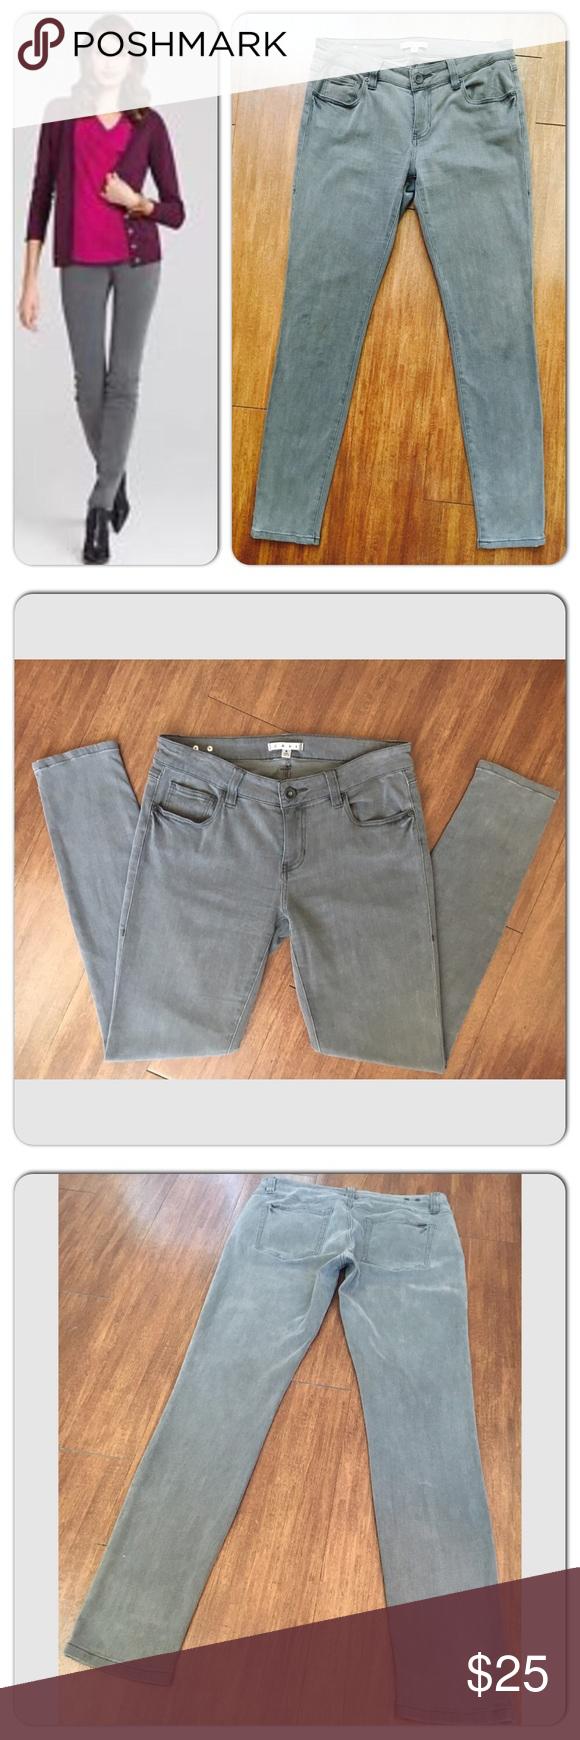 CAbi 921 - Storm Gray Super Skinny Stretch Jeans 8 30 inch inseam. Size 8 CAbi Jeans Skinny